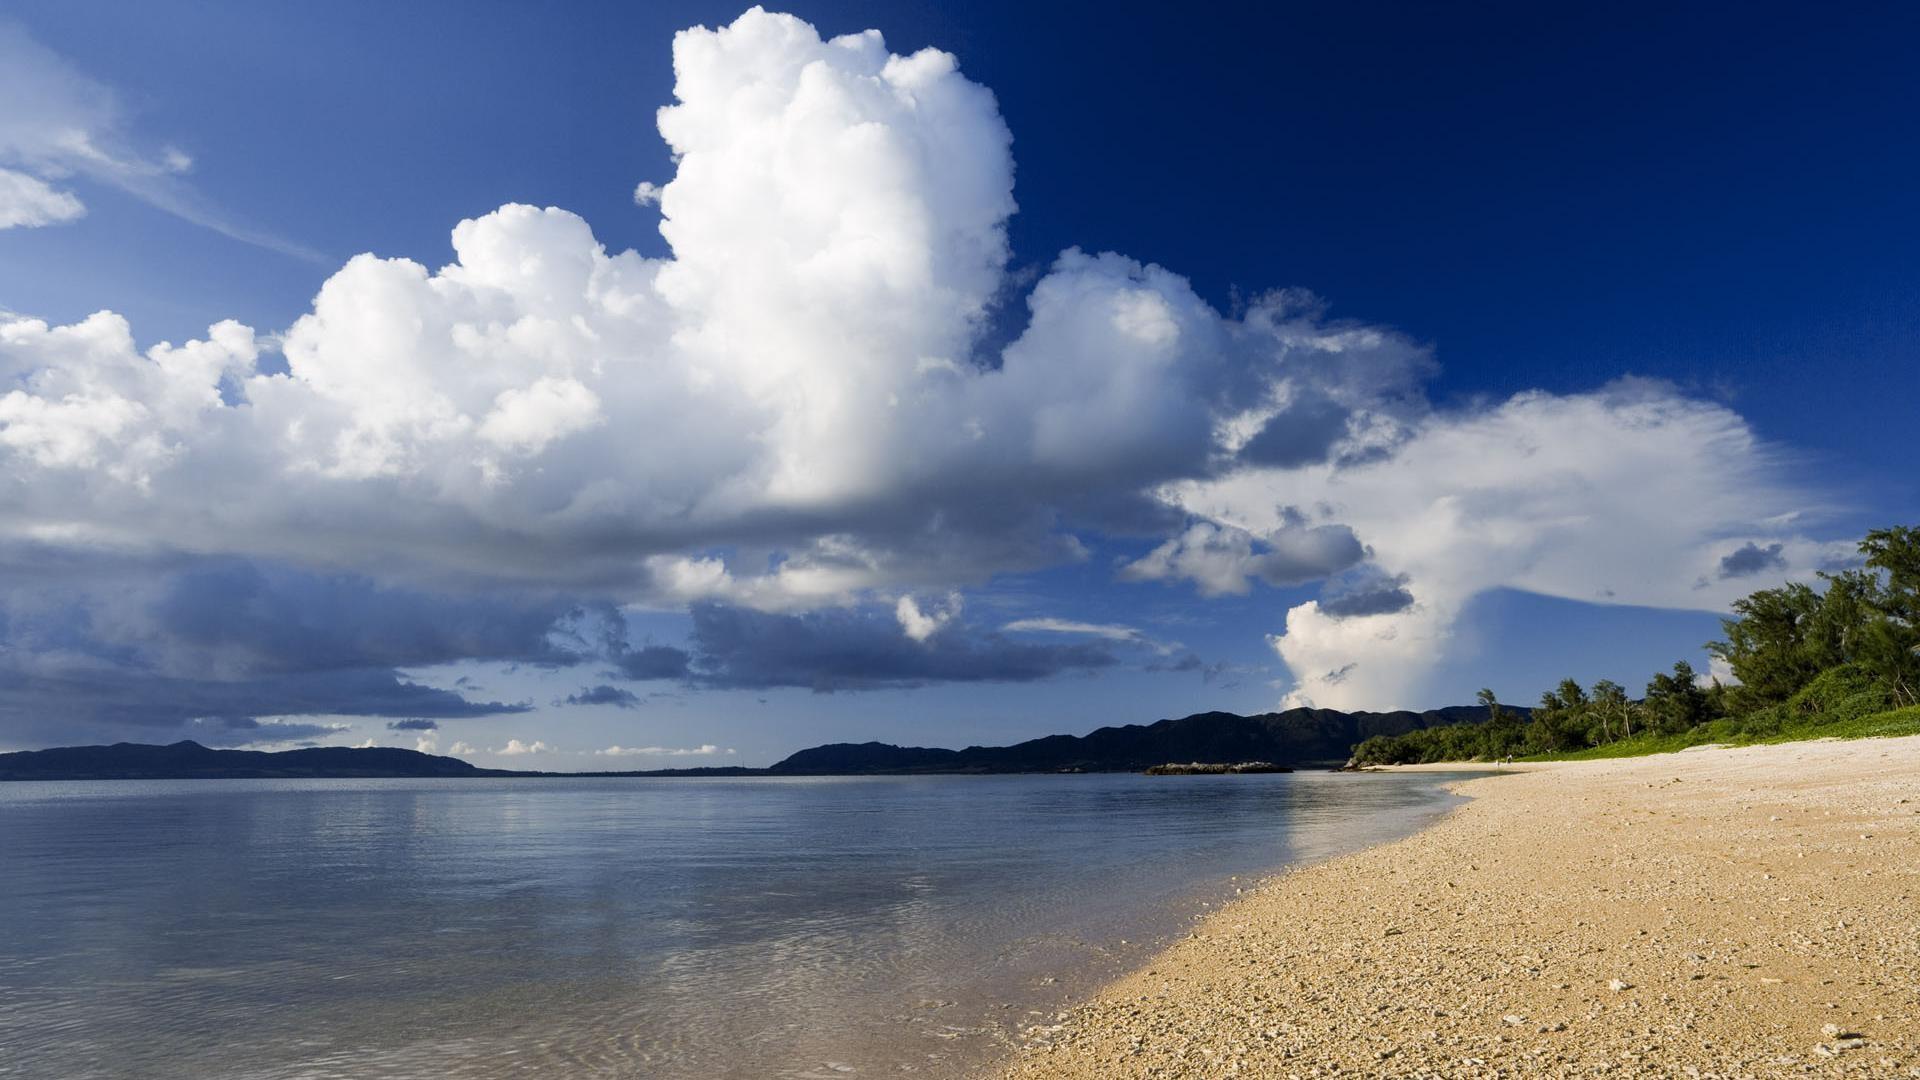 beautiful beach desktop backgrounds wide wallpapers:1280×800,1440×900,1680×1050  – hd backgrounds